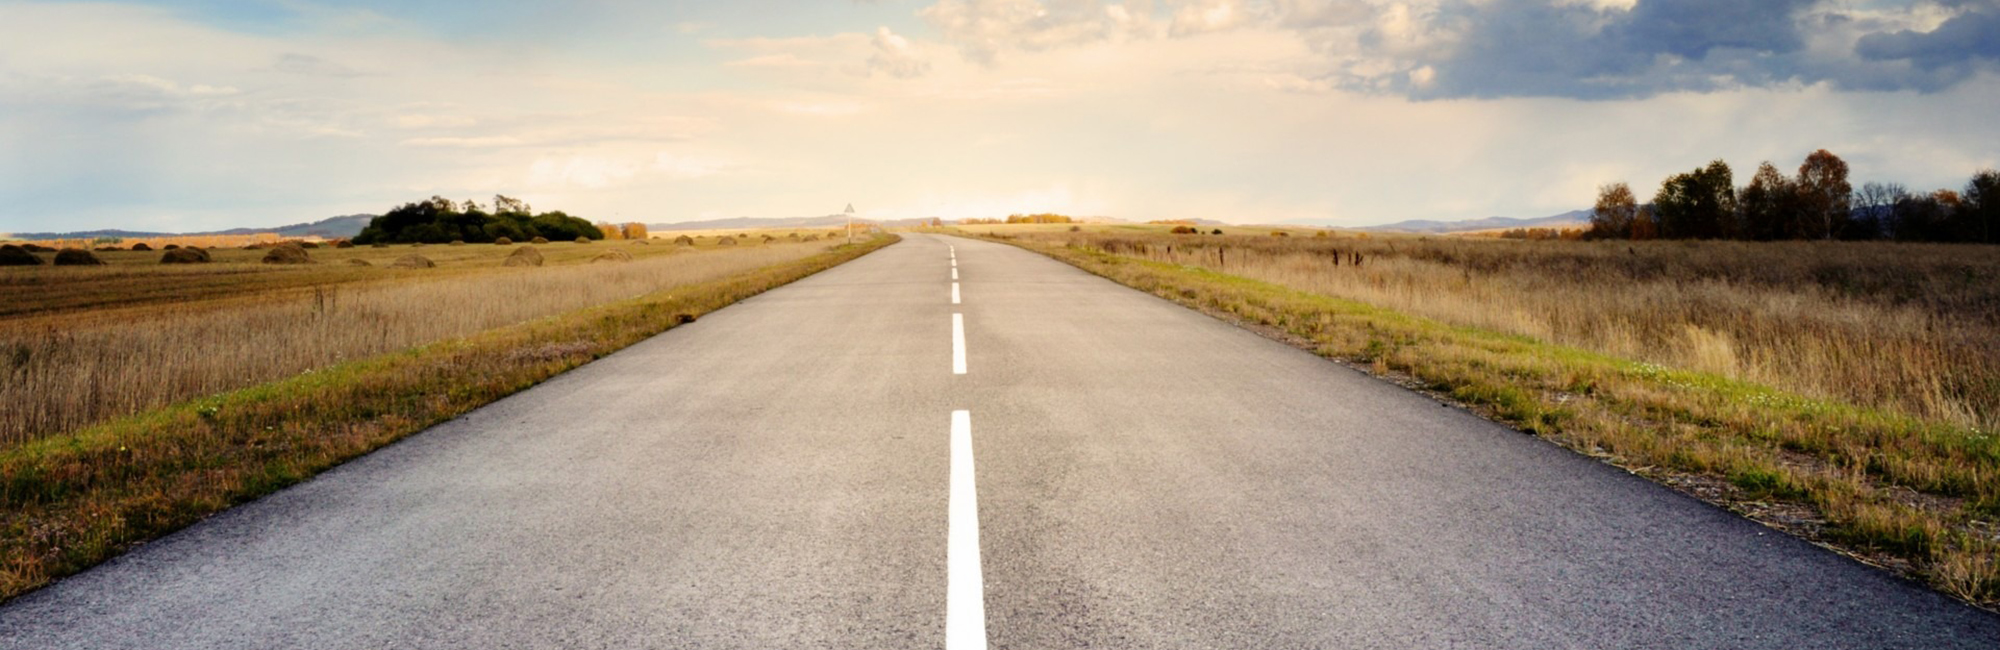 Calgary Asphalt Repairs | Road Savers Western